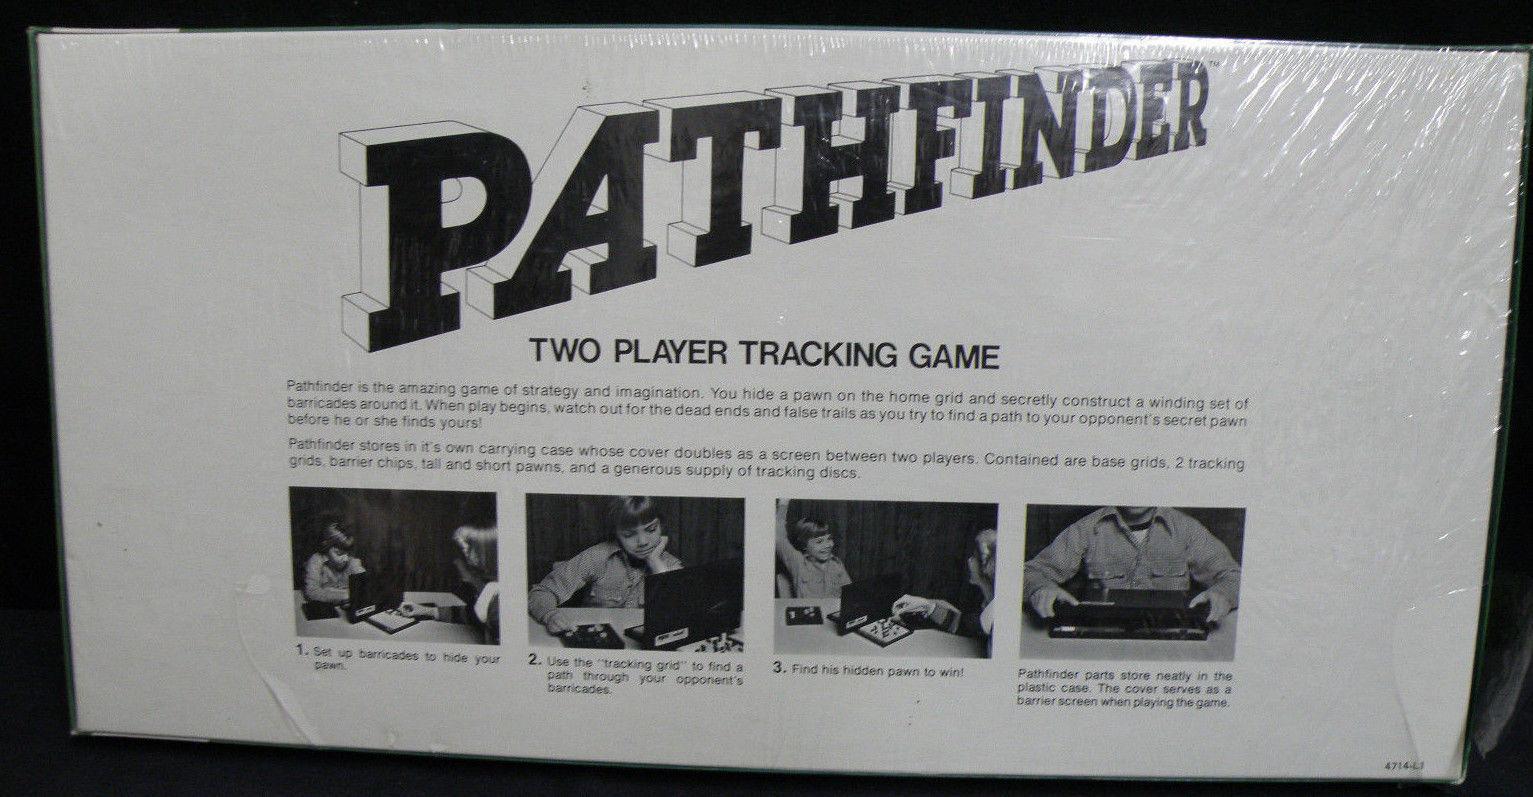 NOS PATHFINDER VINTAGE 1977 MILTON BRADLEY BOARD GAME COMPLETE SEALED NIB UNUSED